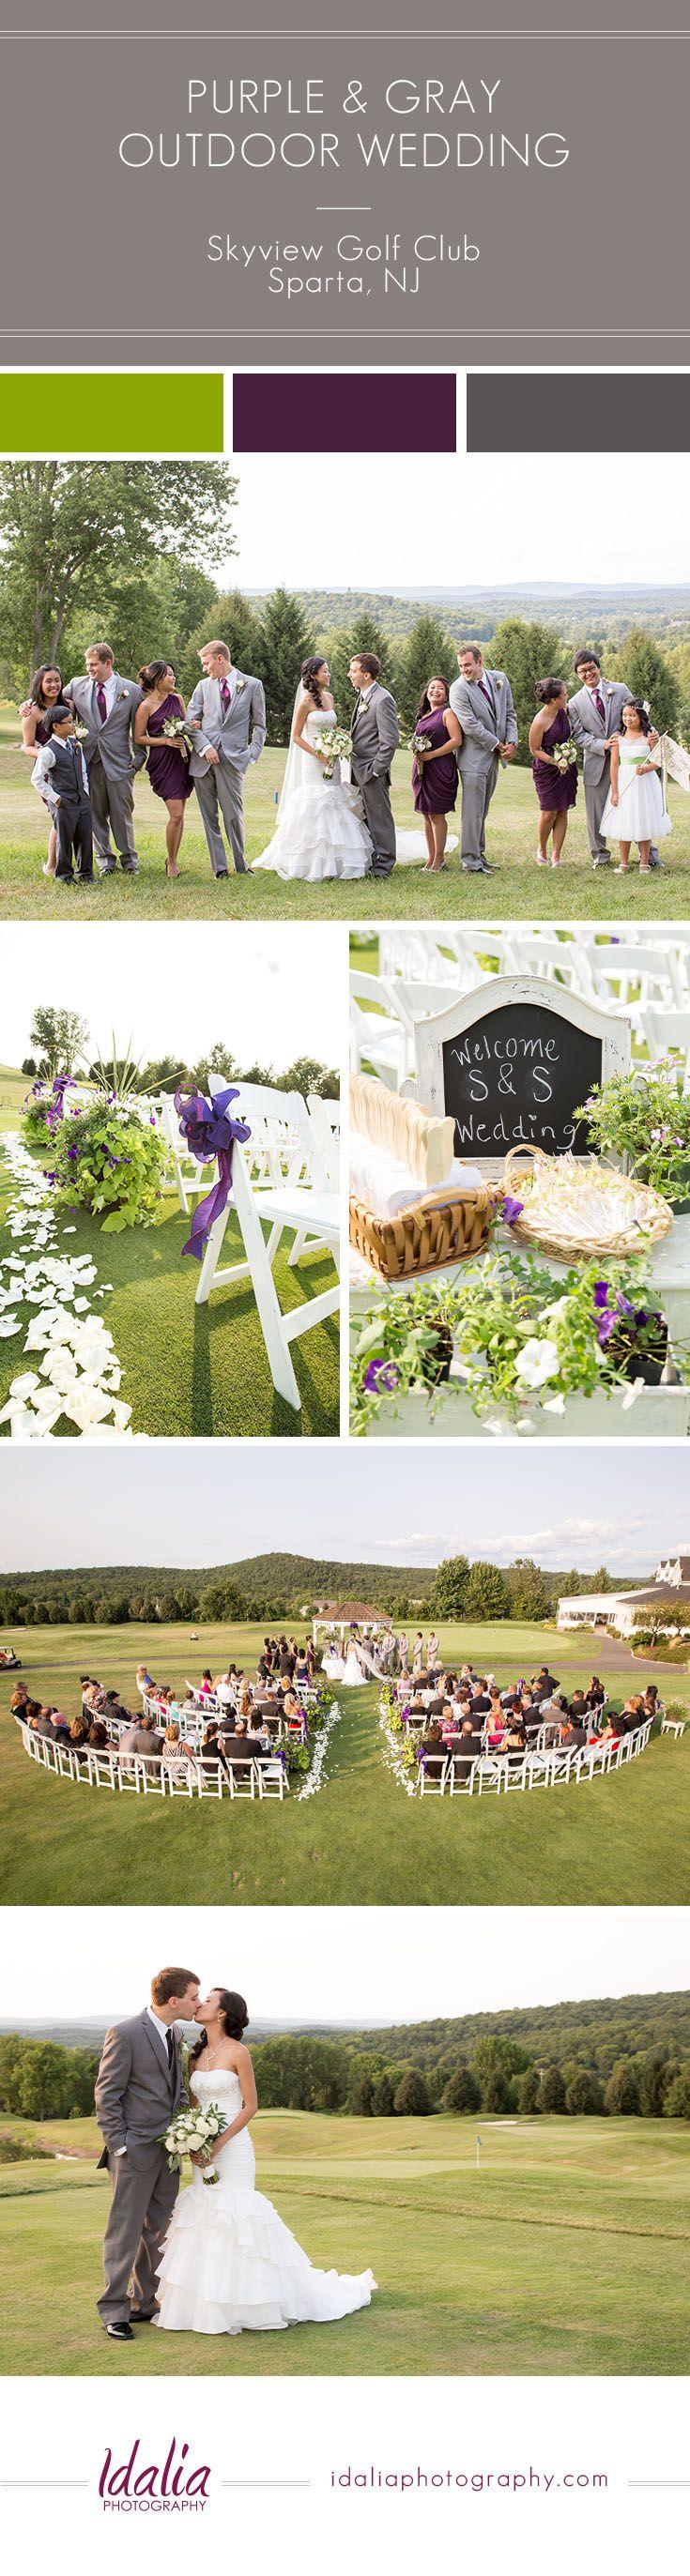 Plum and Gray Outdoor Wedding | Skyview Golf Club Wedding | Sparta, NJ